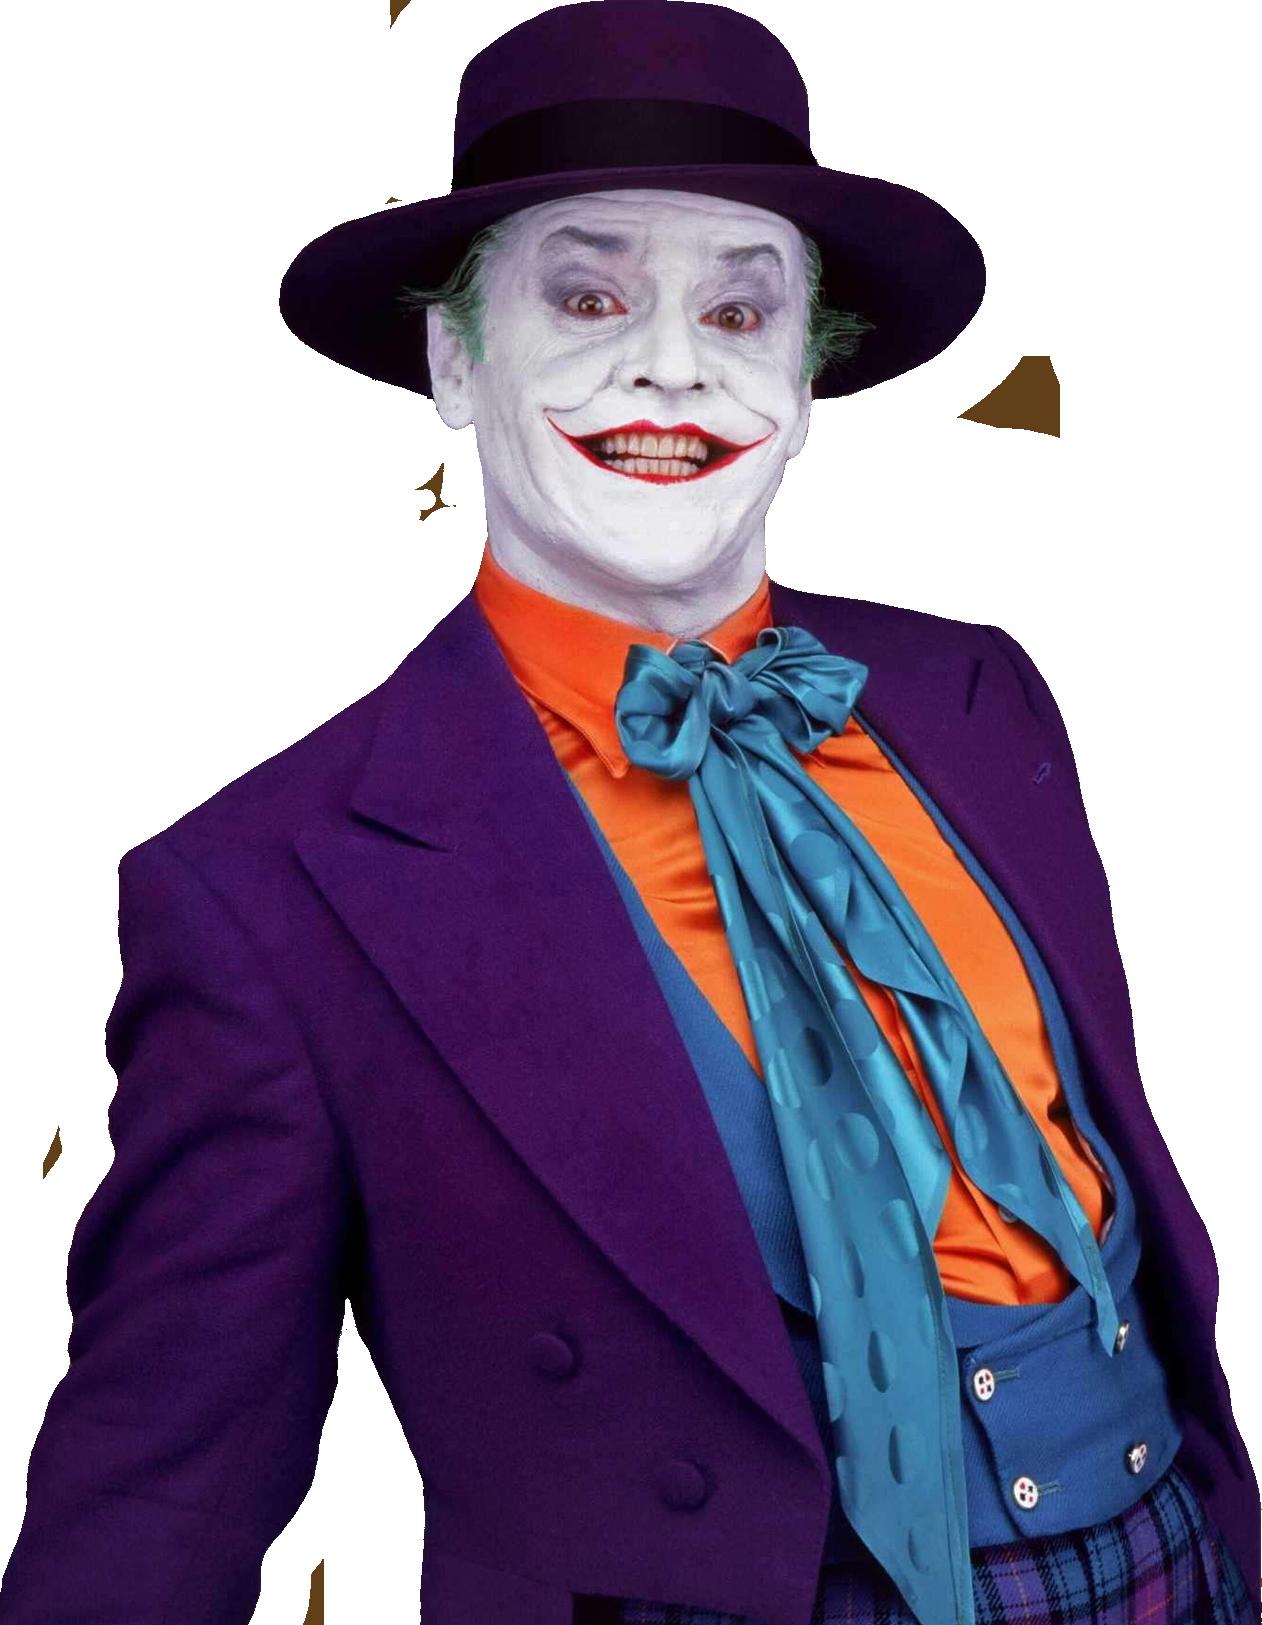 Jack Nicholson Joker Quotes Batman Quotesgram